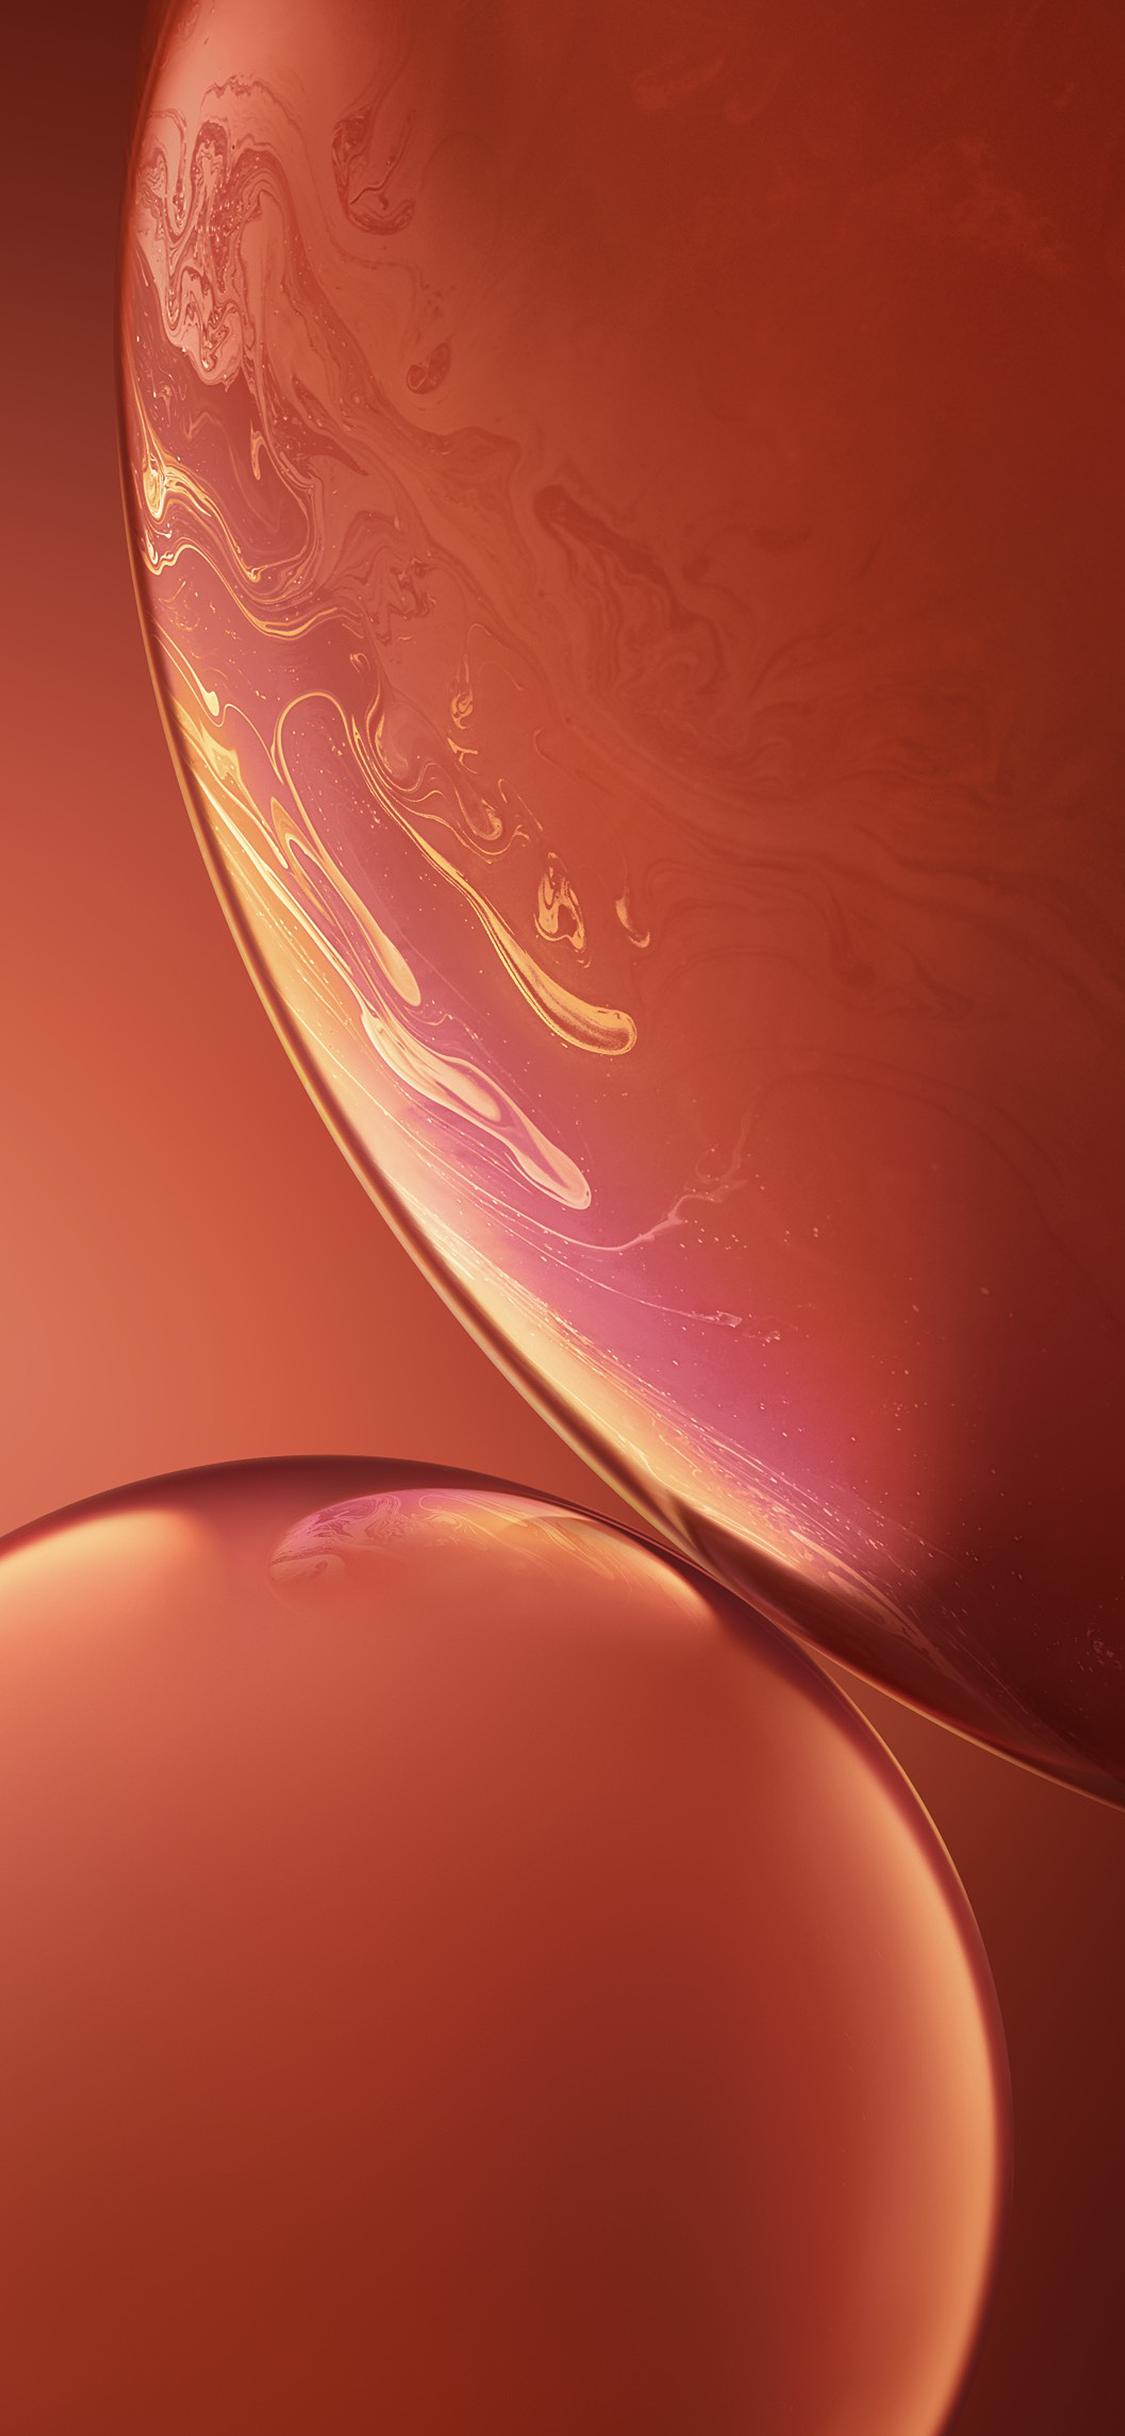 iPhone XR Orange Bubbles Wallpaper